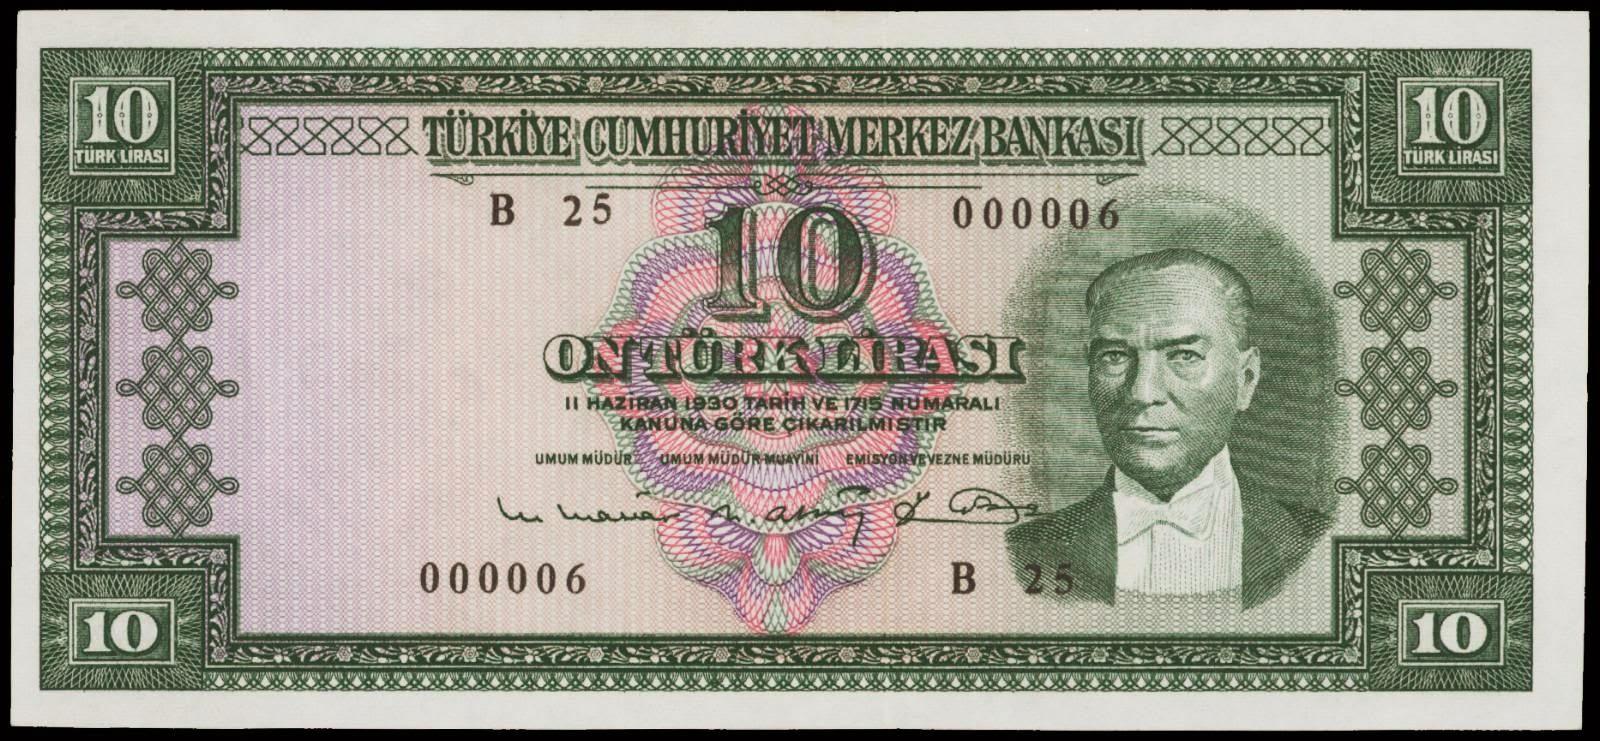 Turkey banknotes 10 Turkish Lira banknote 1960 Atatürk